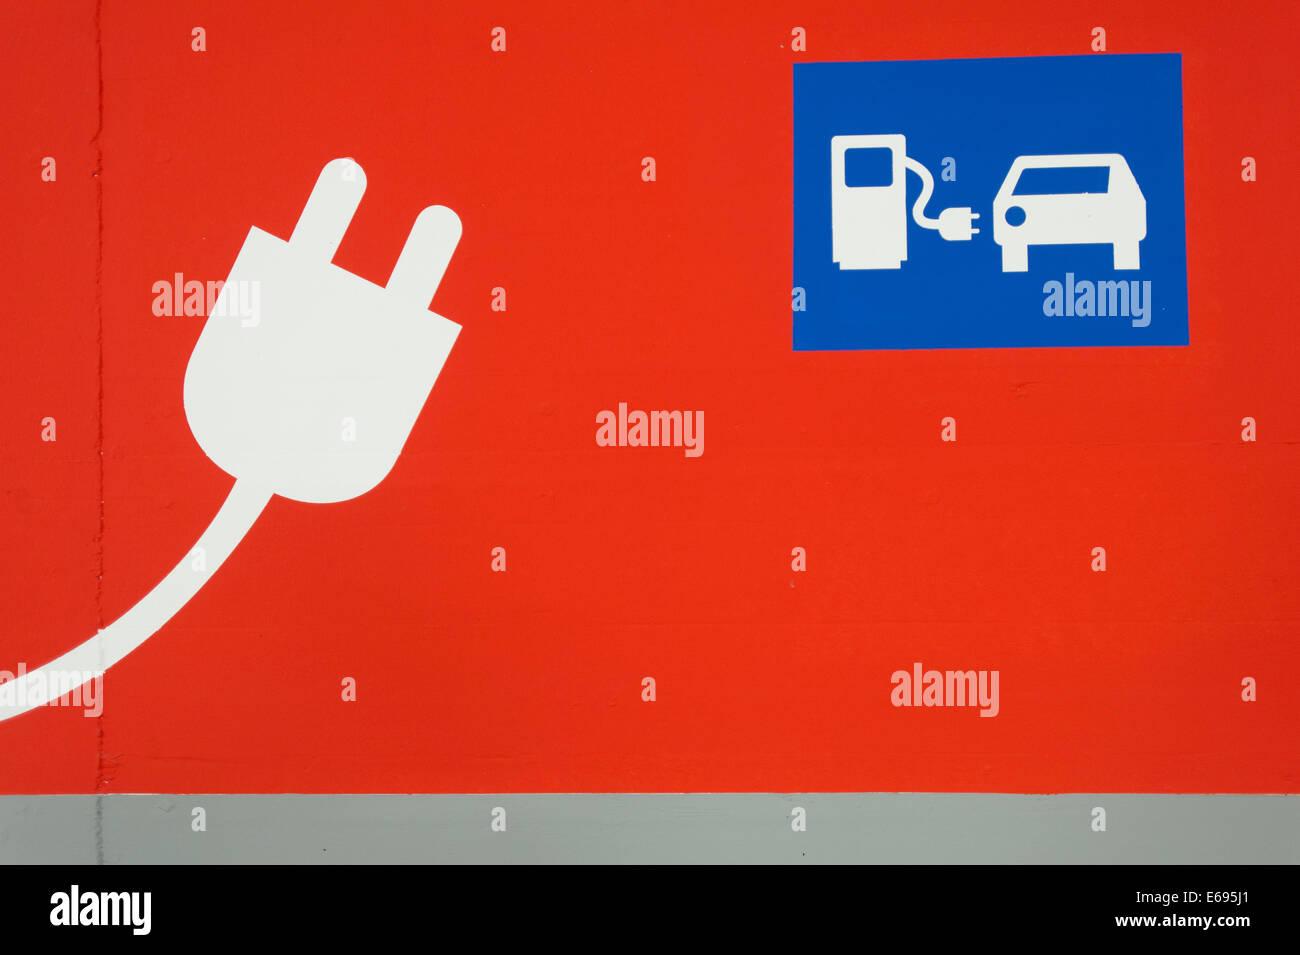 Piktogramm, E.ON Elektroauto Ladestation, München, Upper Bavaria, Bavaria, Germany Stockbild